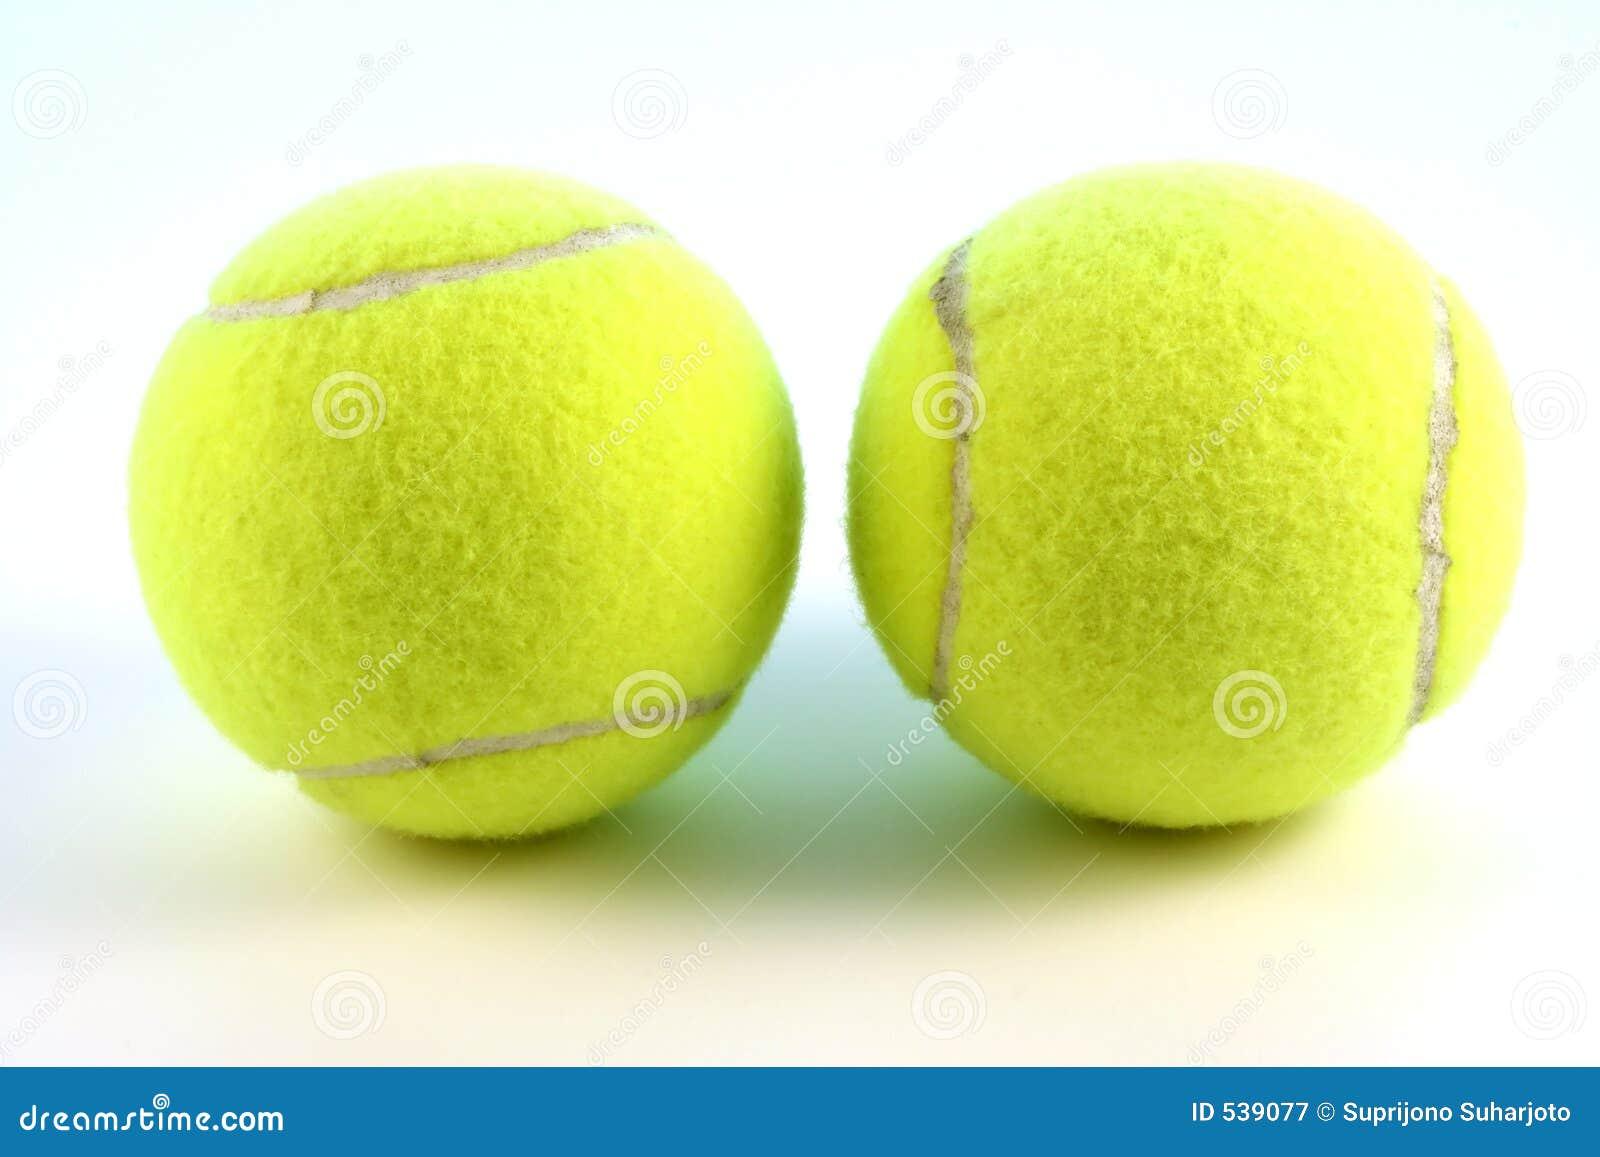 Download 球网球 库存图片. 图片 包括有 竹子, 现场, 黄色, 比赛, 小组, 网球 - 539077